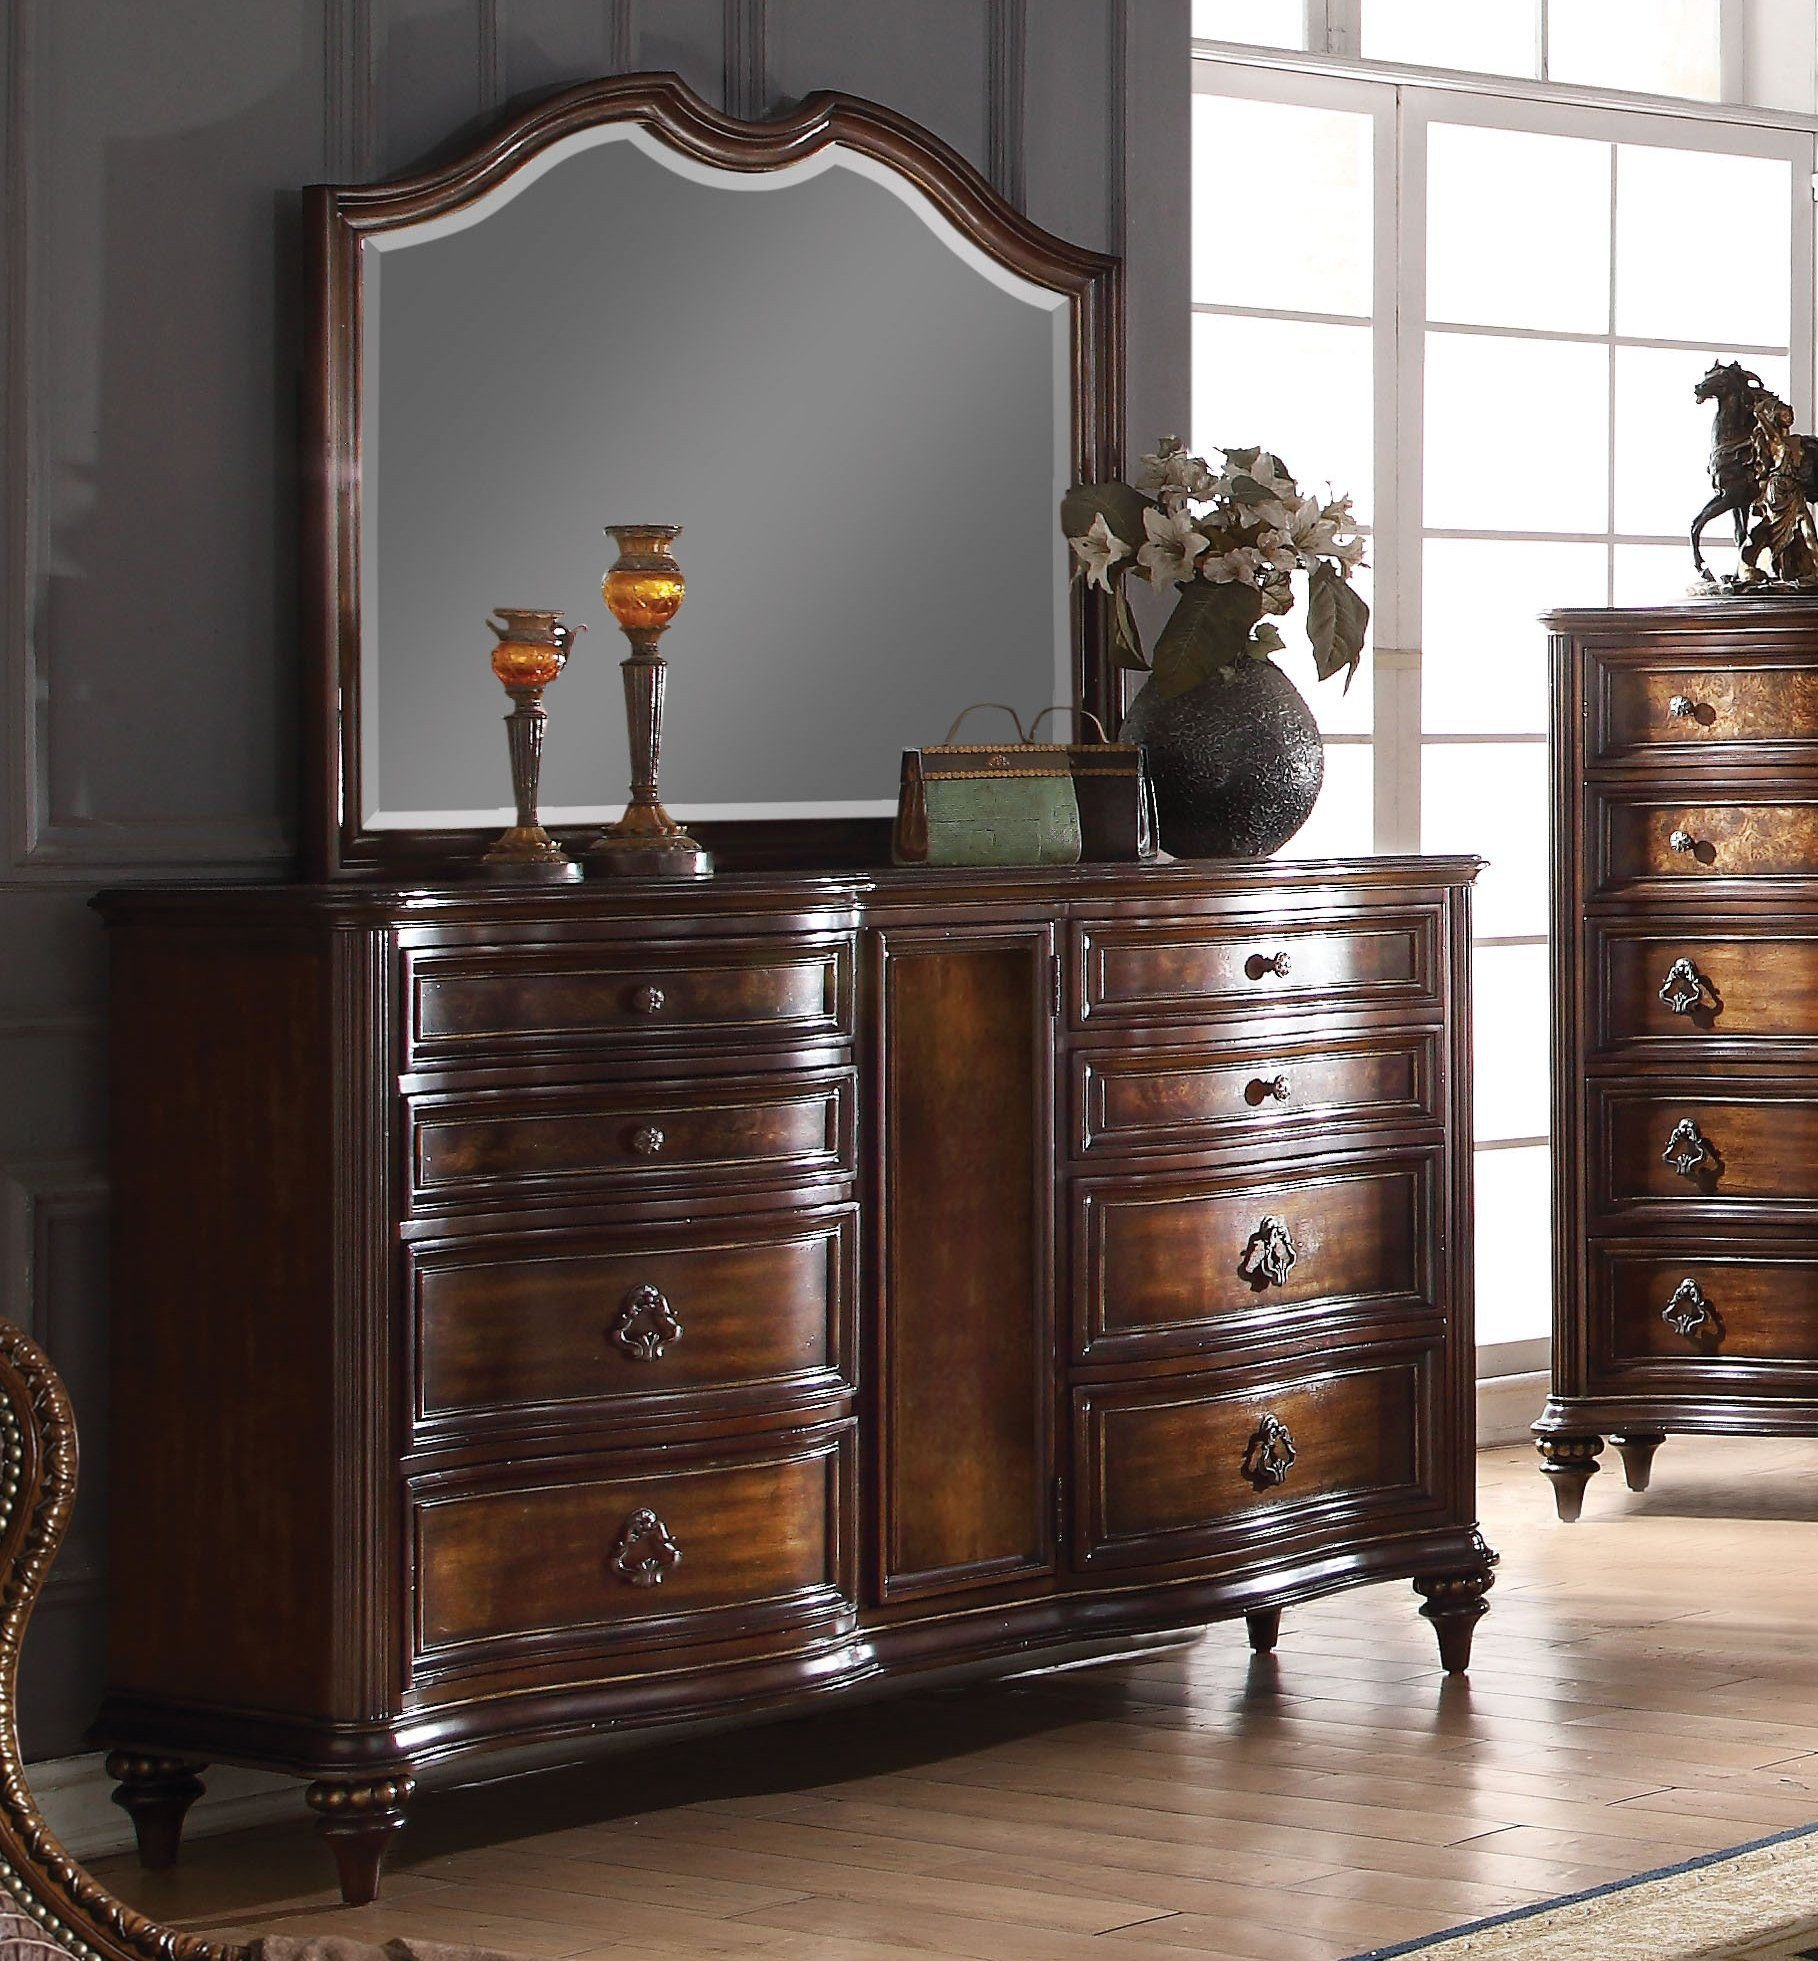 Acme Furniture Bedroom Set Elegant Acme Azis Dark Walnut Drawer Dresser and Mirror